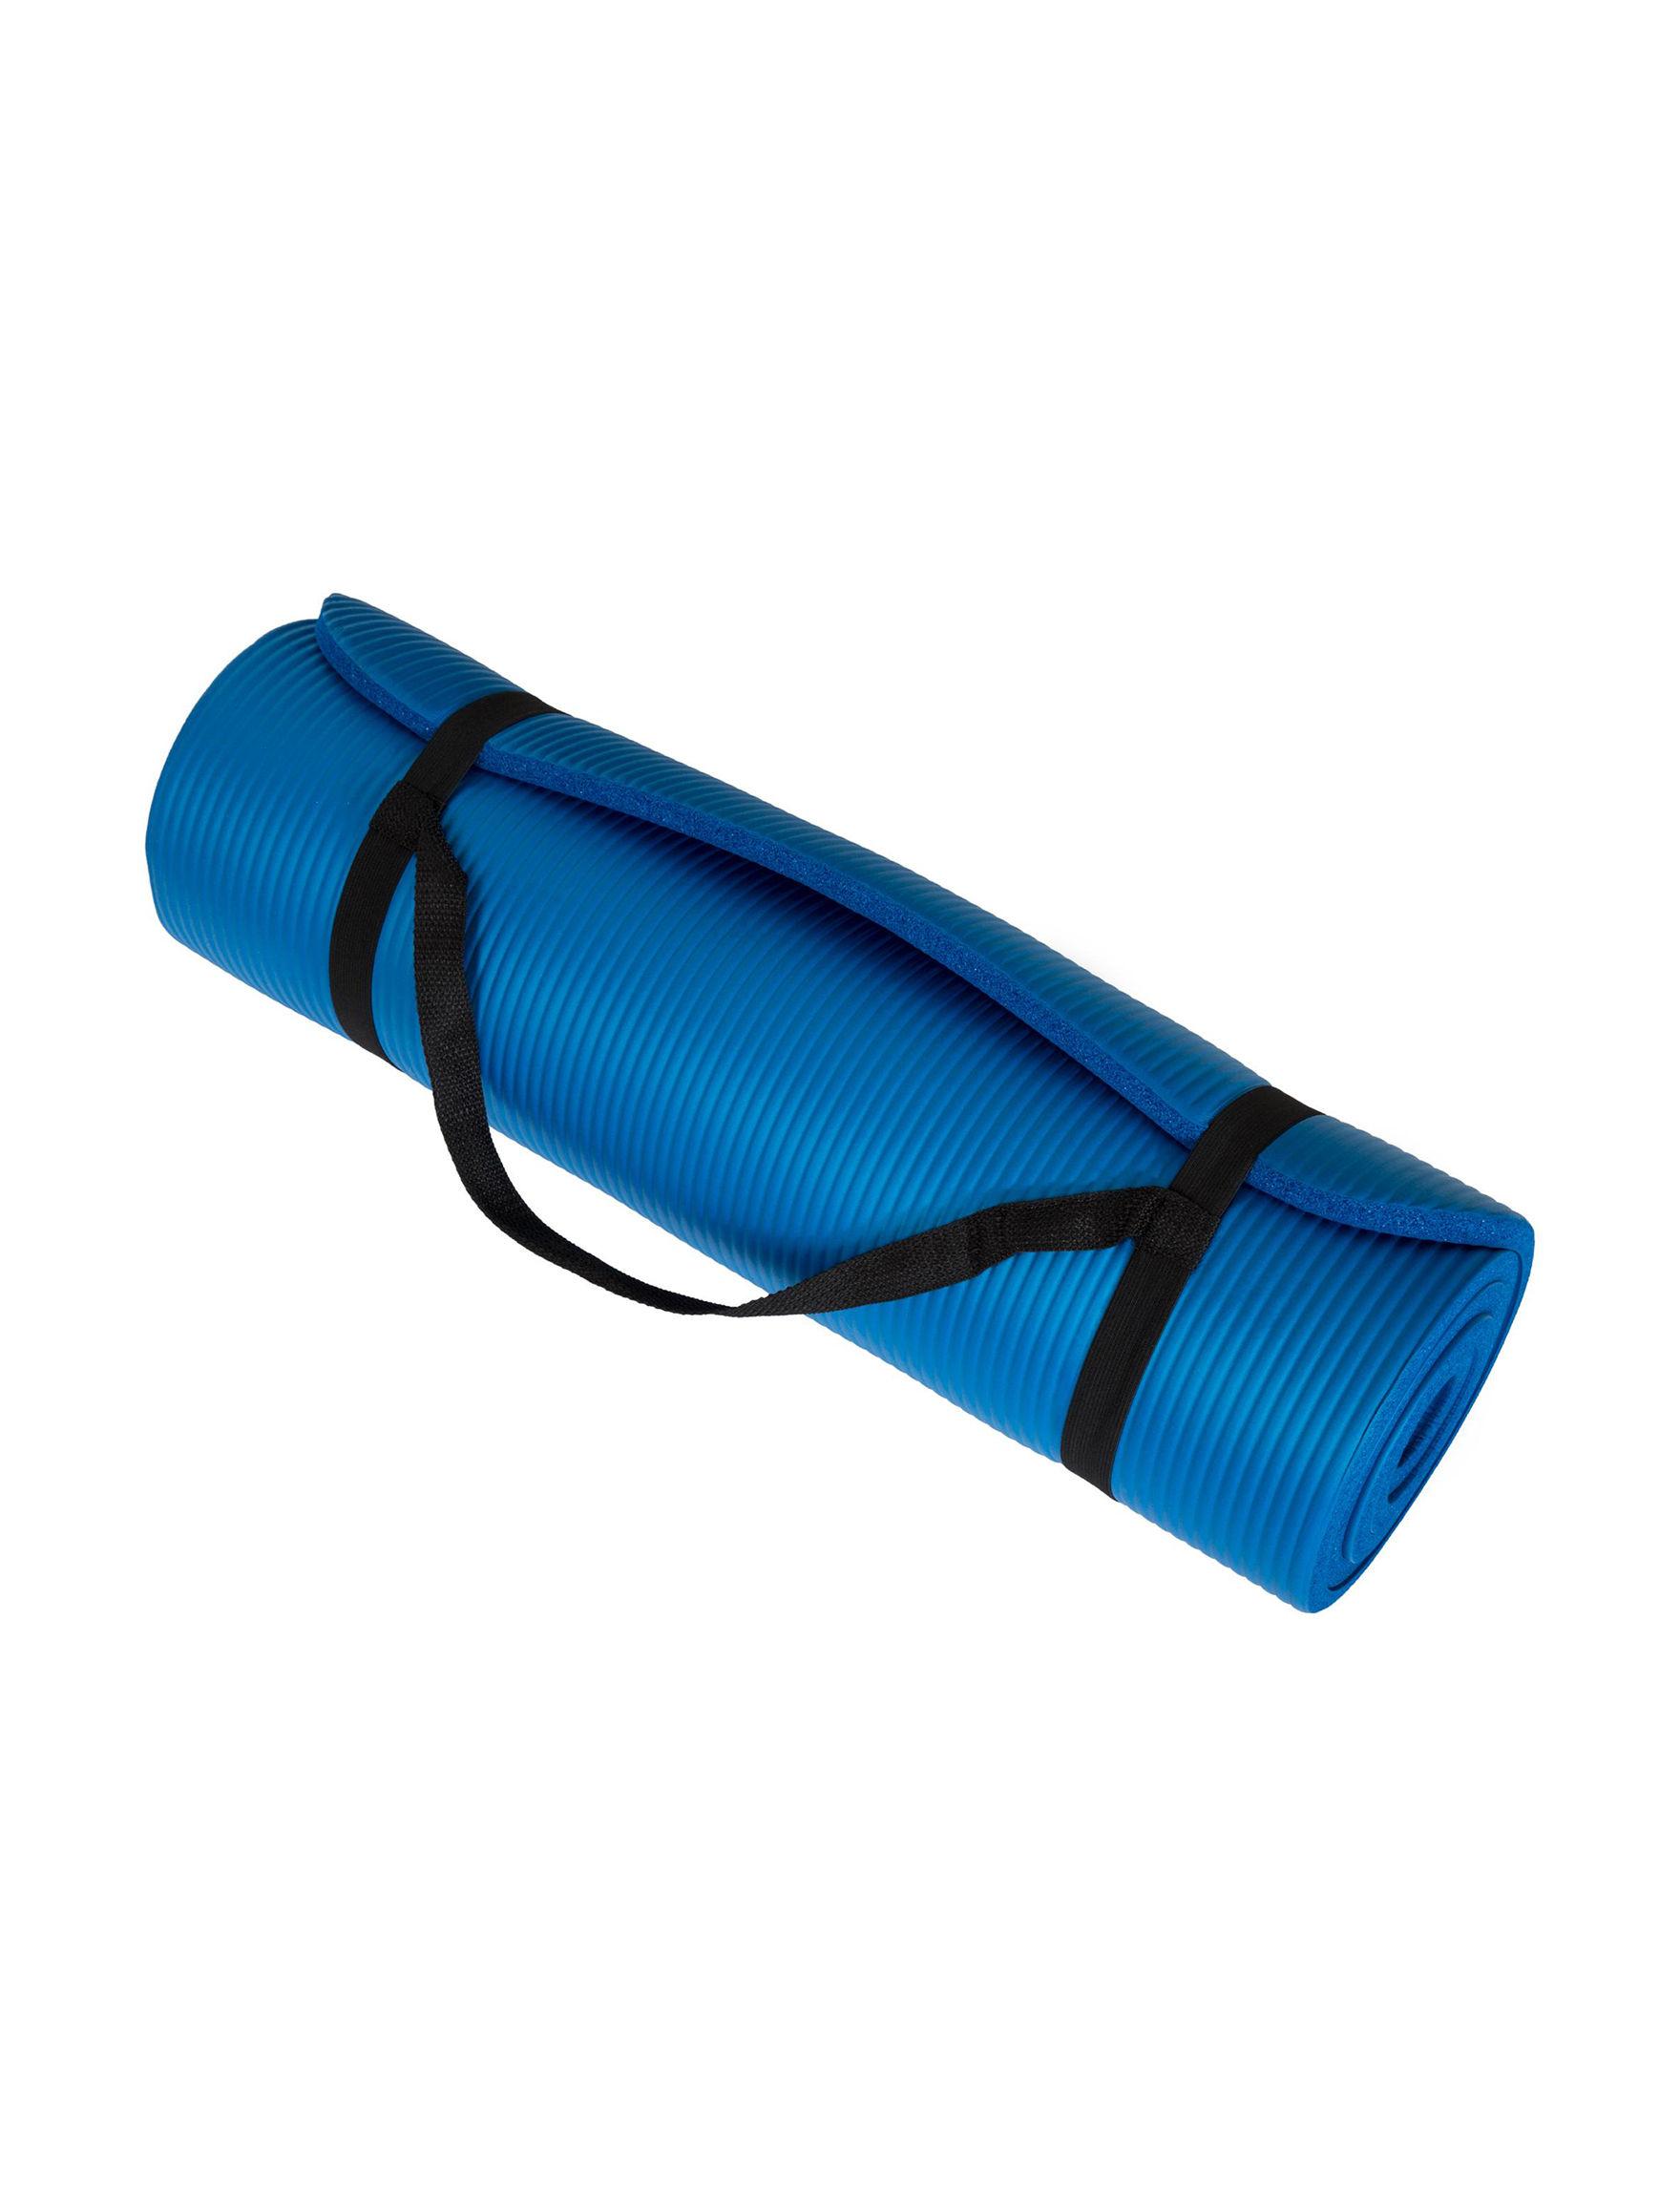 Wakeman Blue Accessories Fitness Equipment